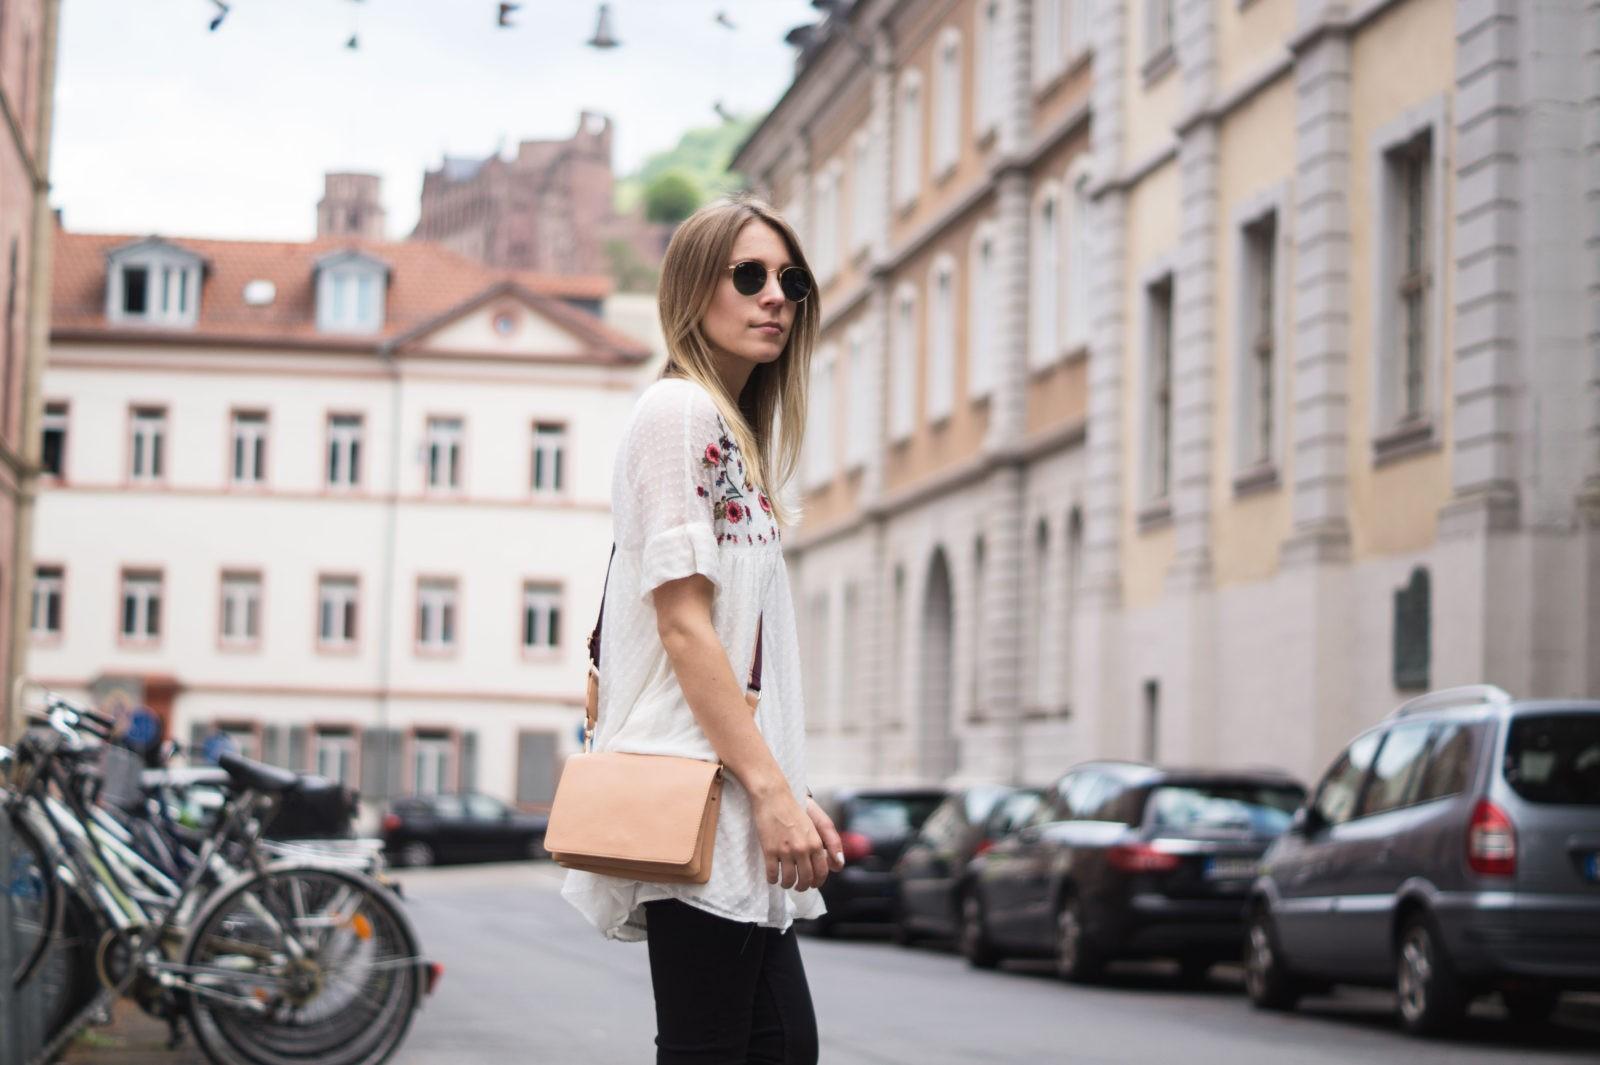 Floral Summer Dress Zara Jumpsuit Black Loafers Pantoletten Sommerkleid Streetstyle Heidelberg Sariety Modeblog Fashionblogger Streetstyle Schloss